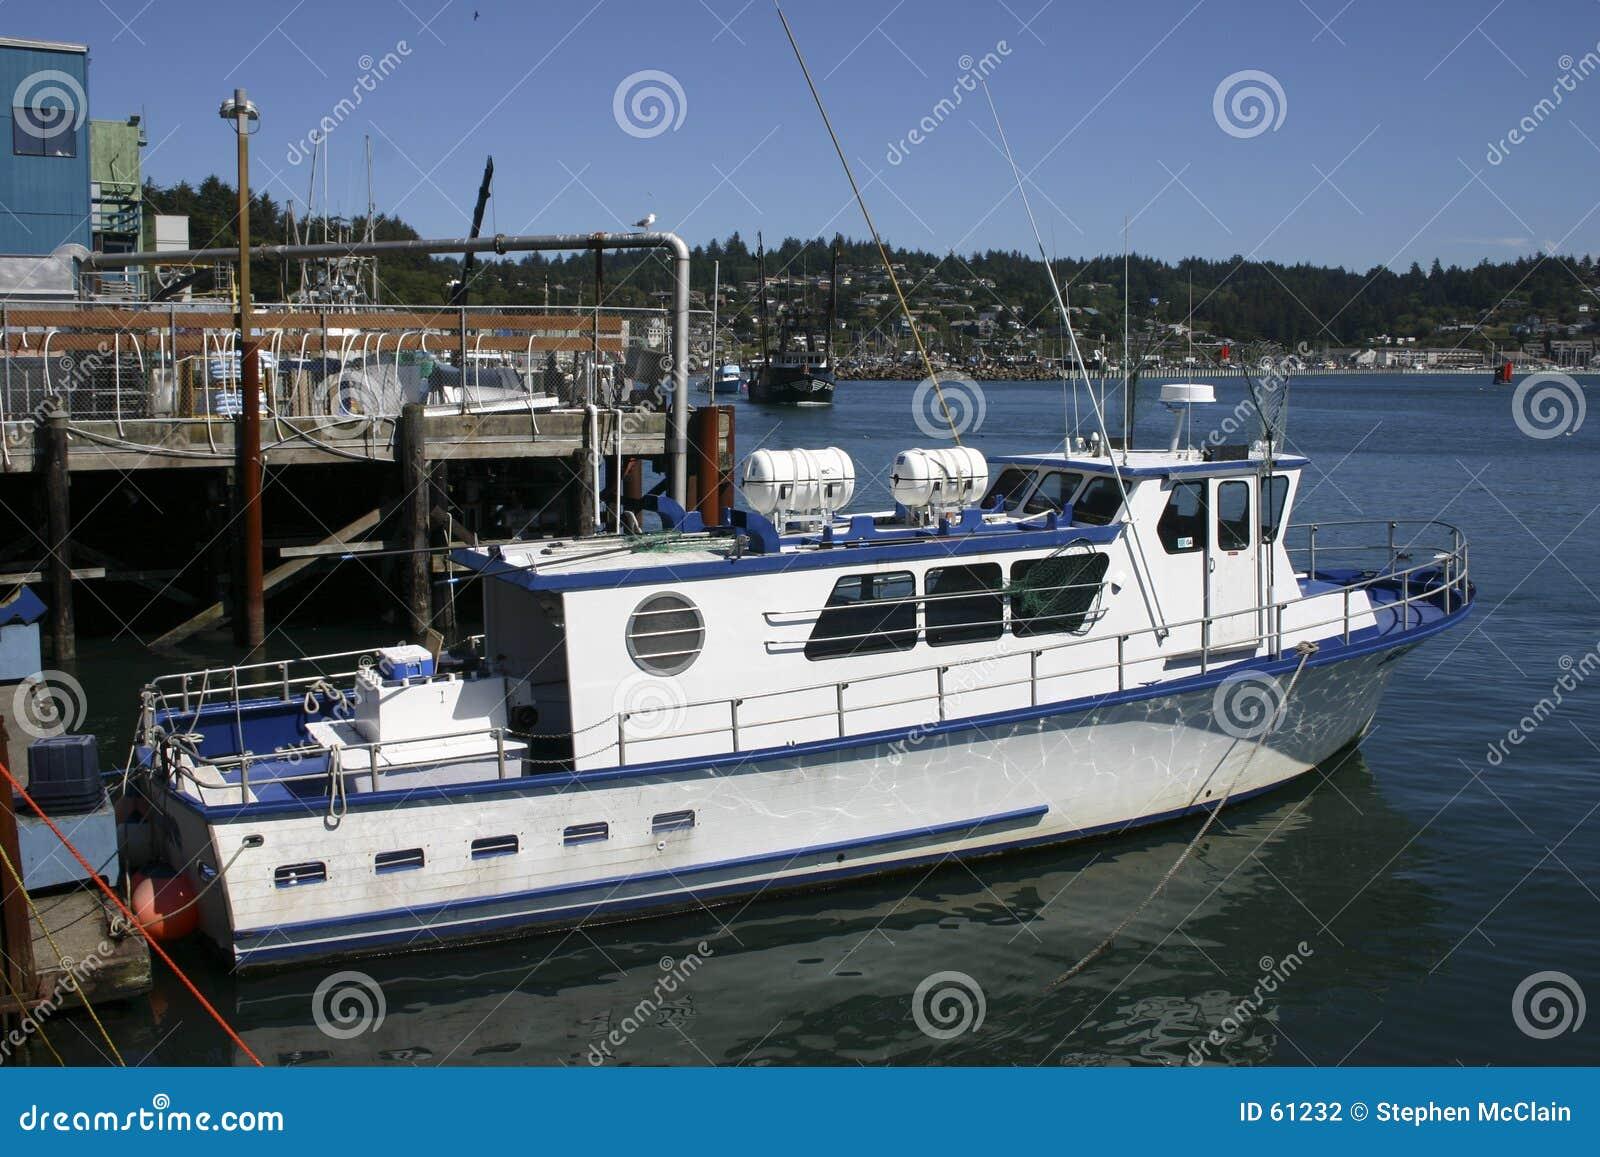 Boat in Newport Harbor